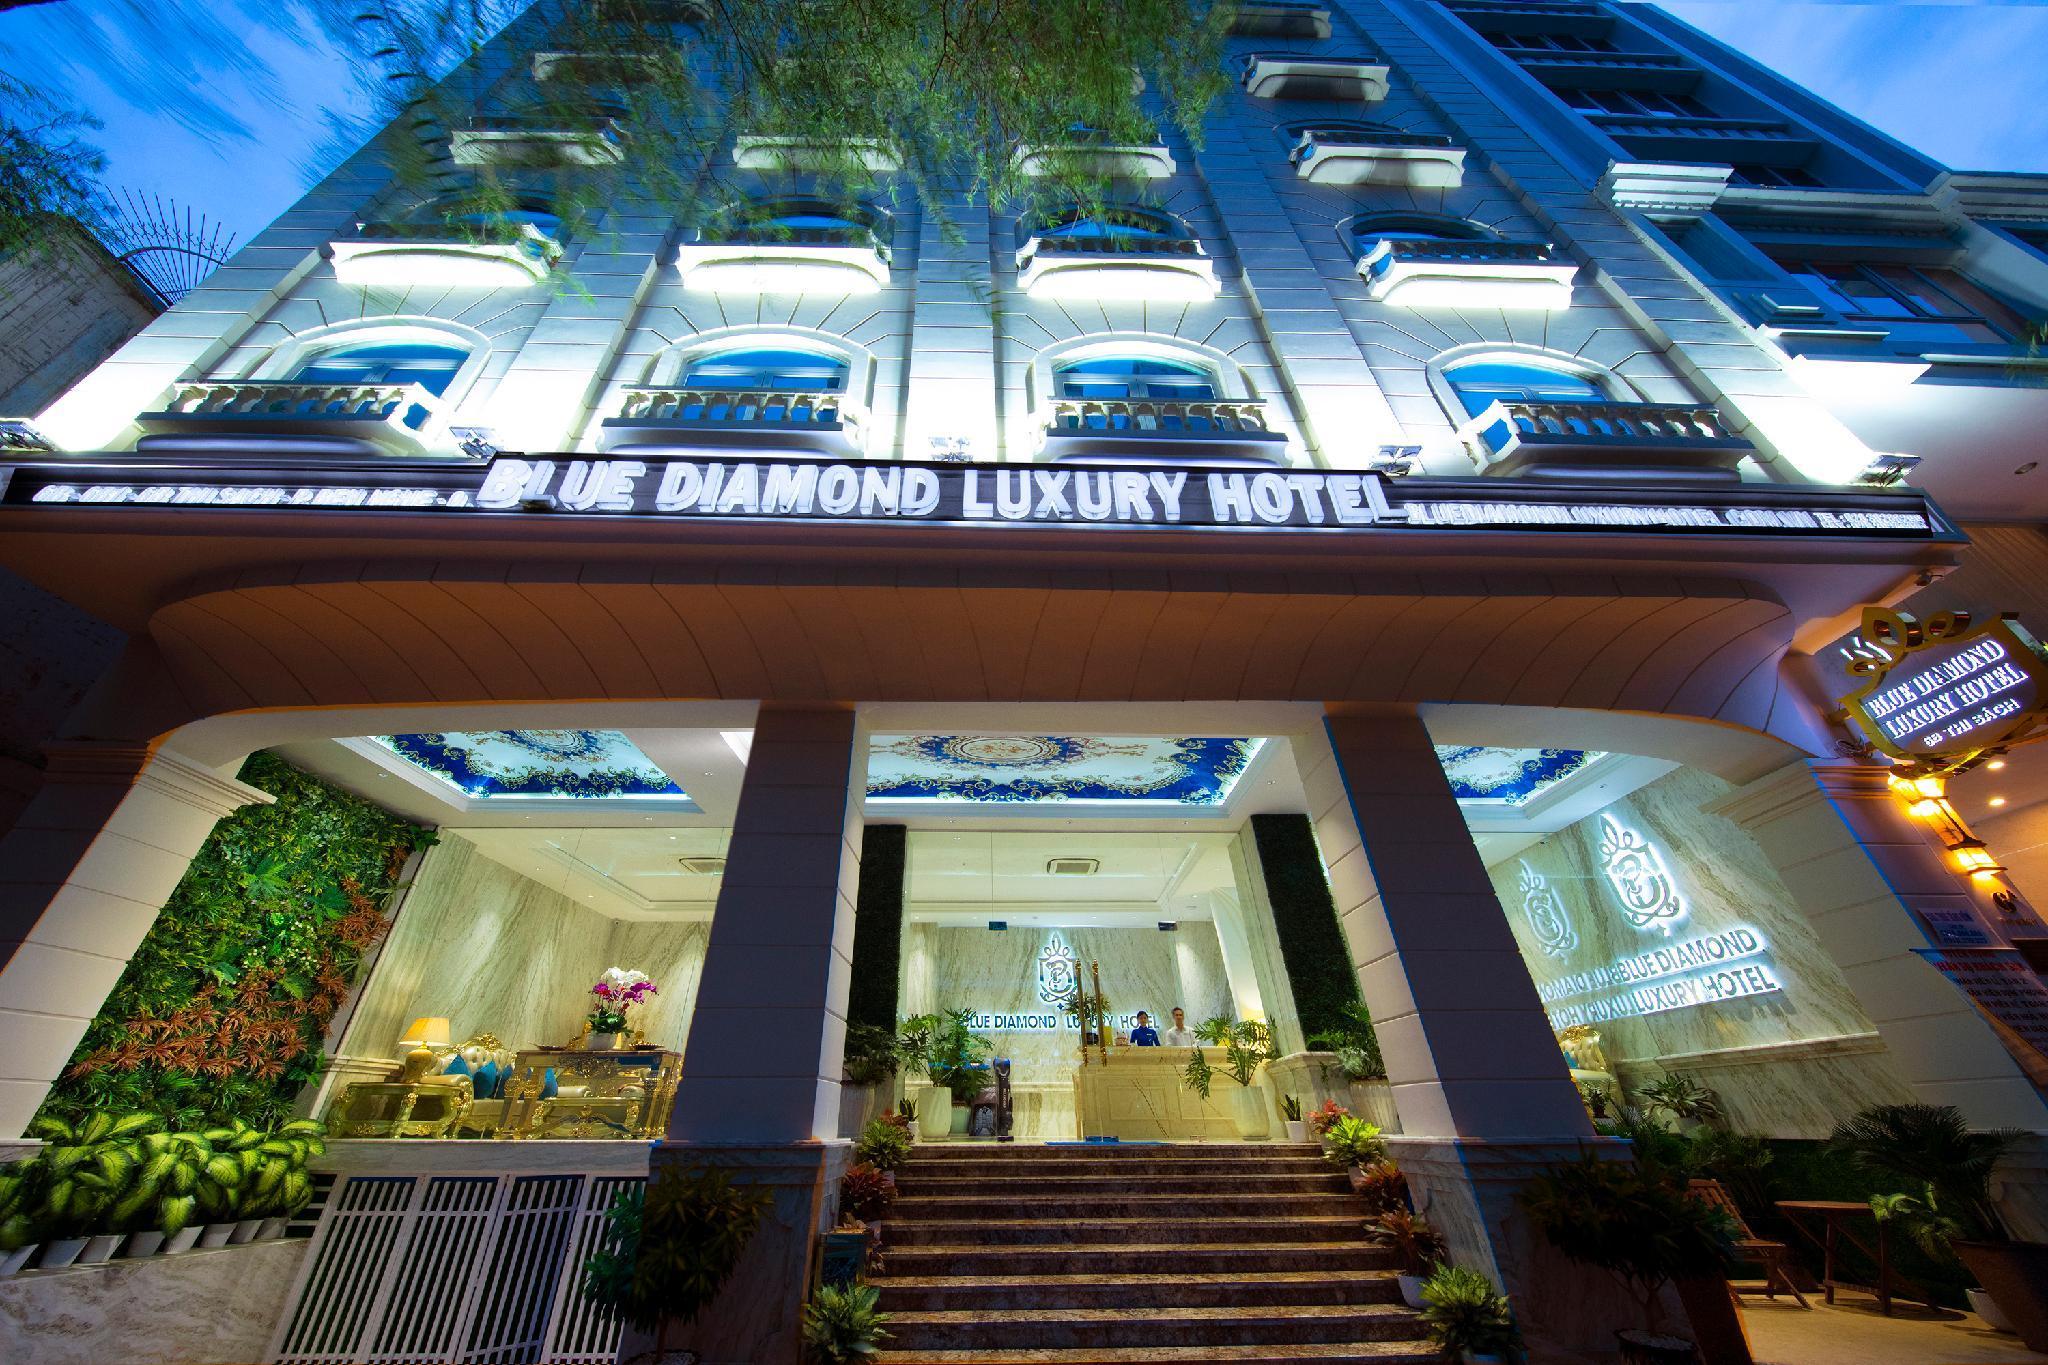 Blue Diamond Luxury Hotel